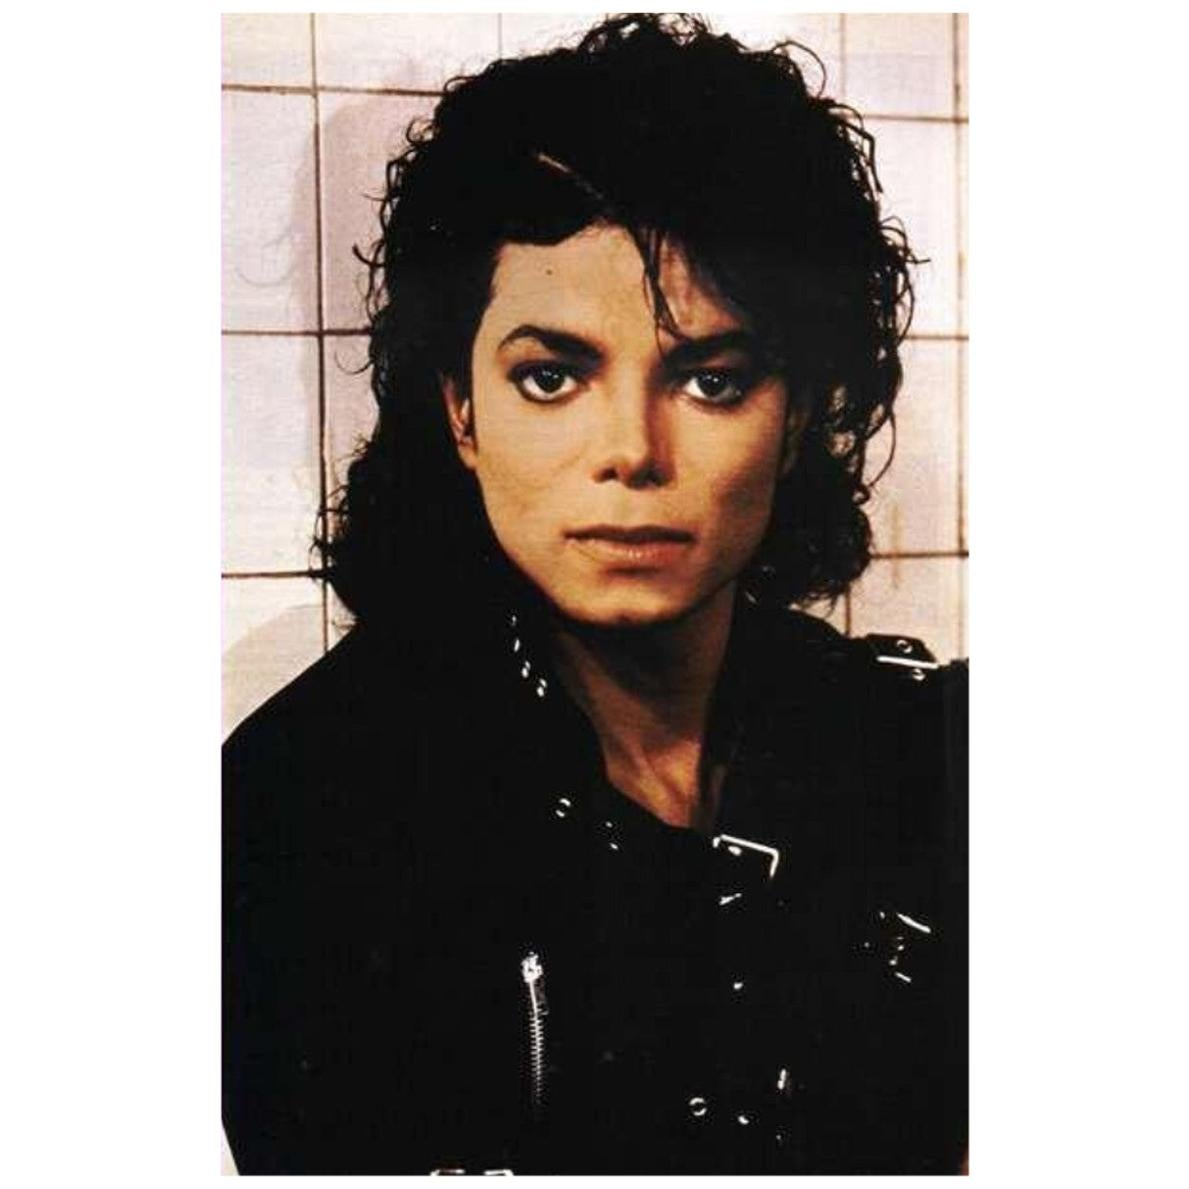 Michael Jackson Authentic Strand of Hair